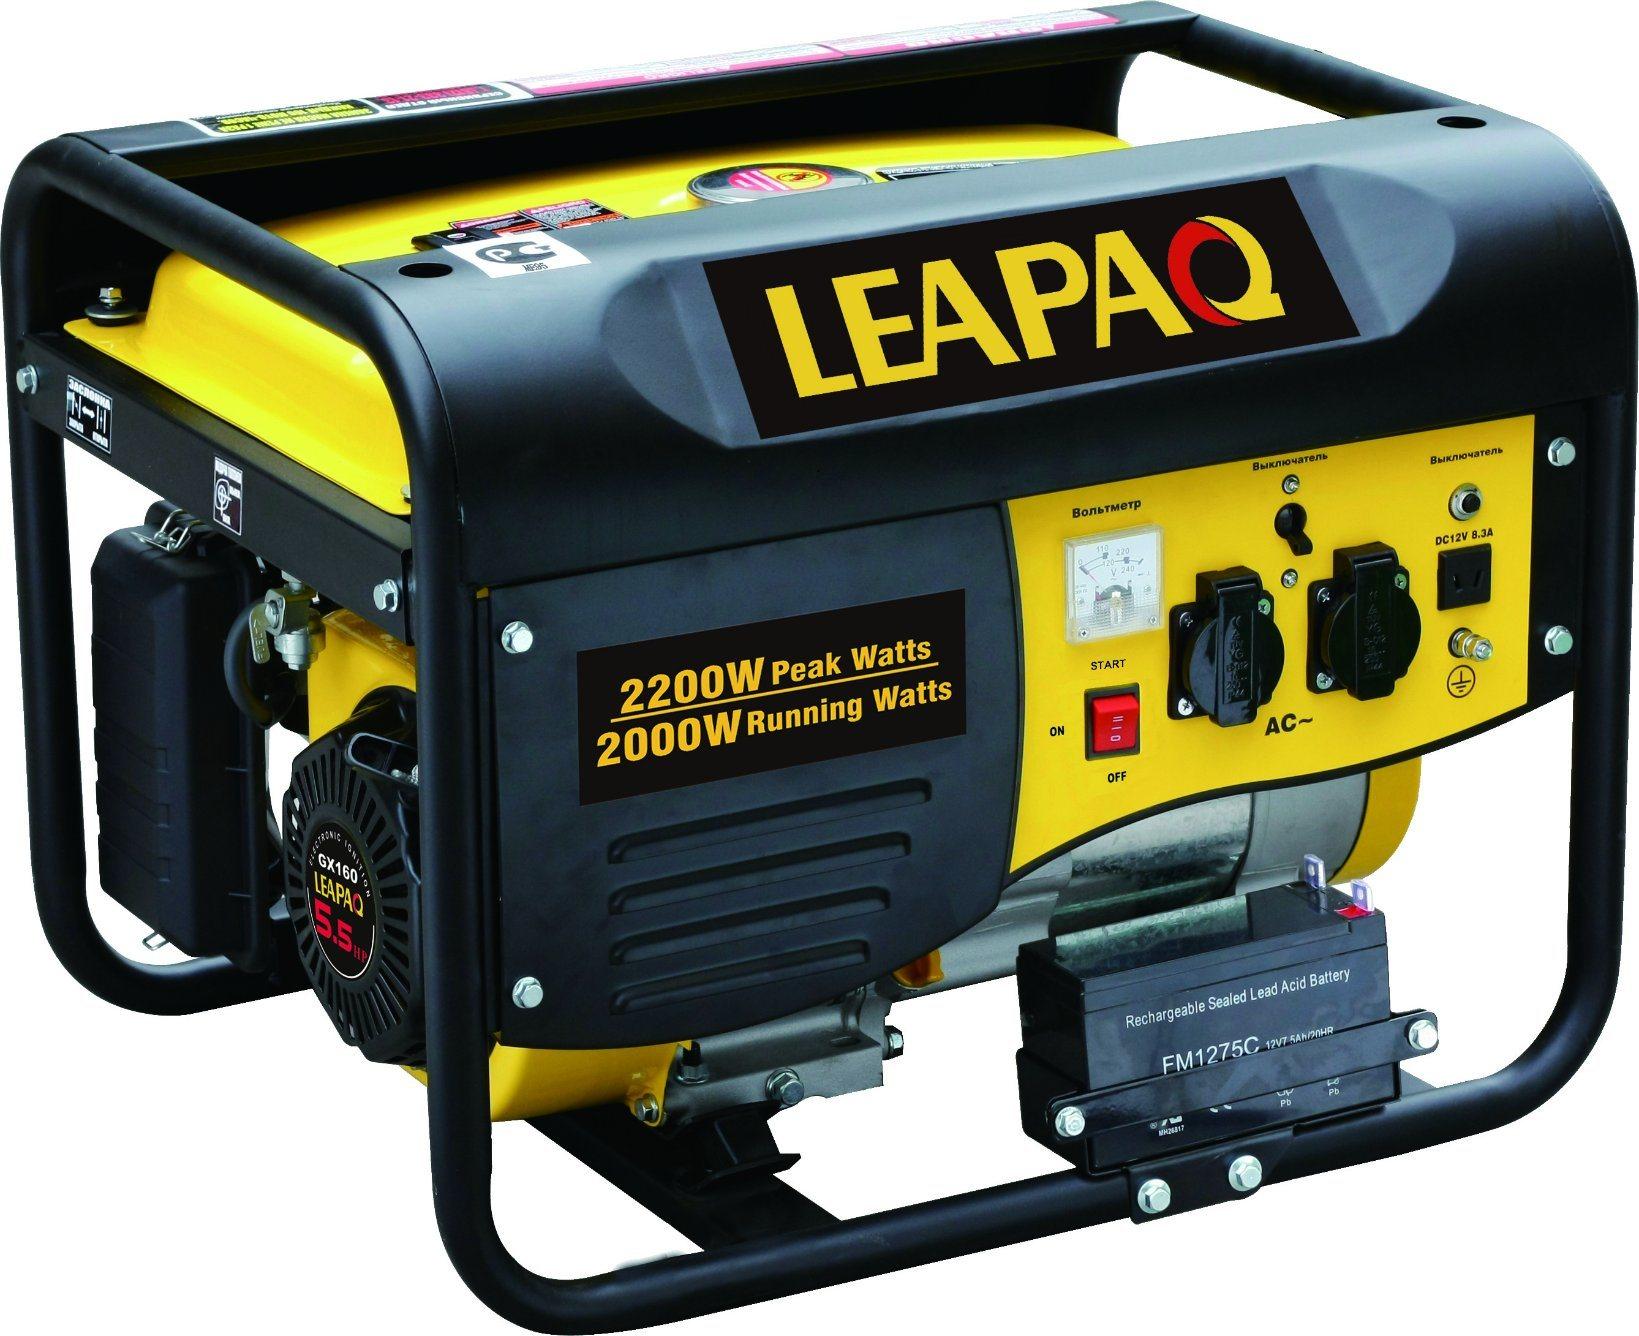 2.0kw Electric Start P-Type Portable Gasoline Generator